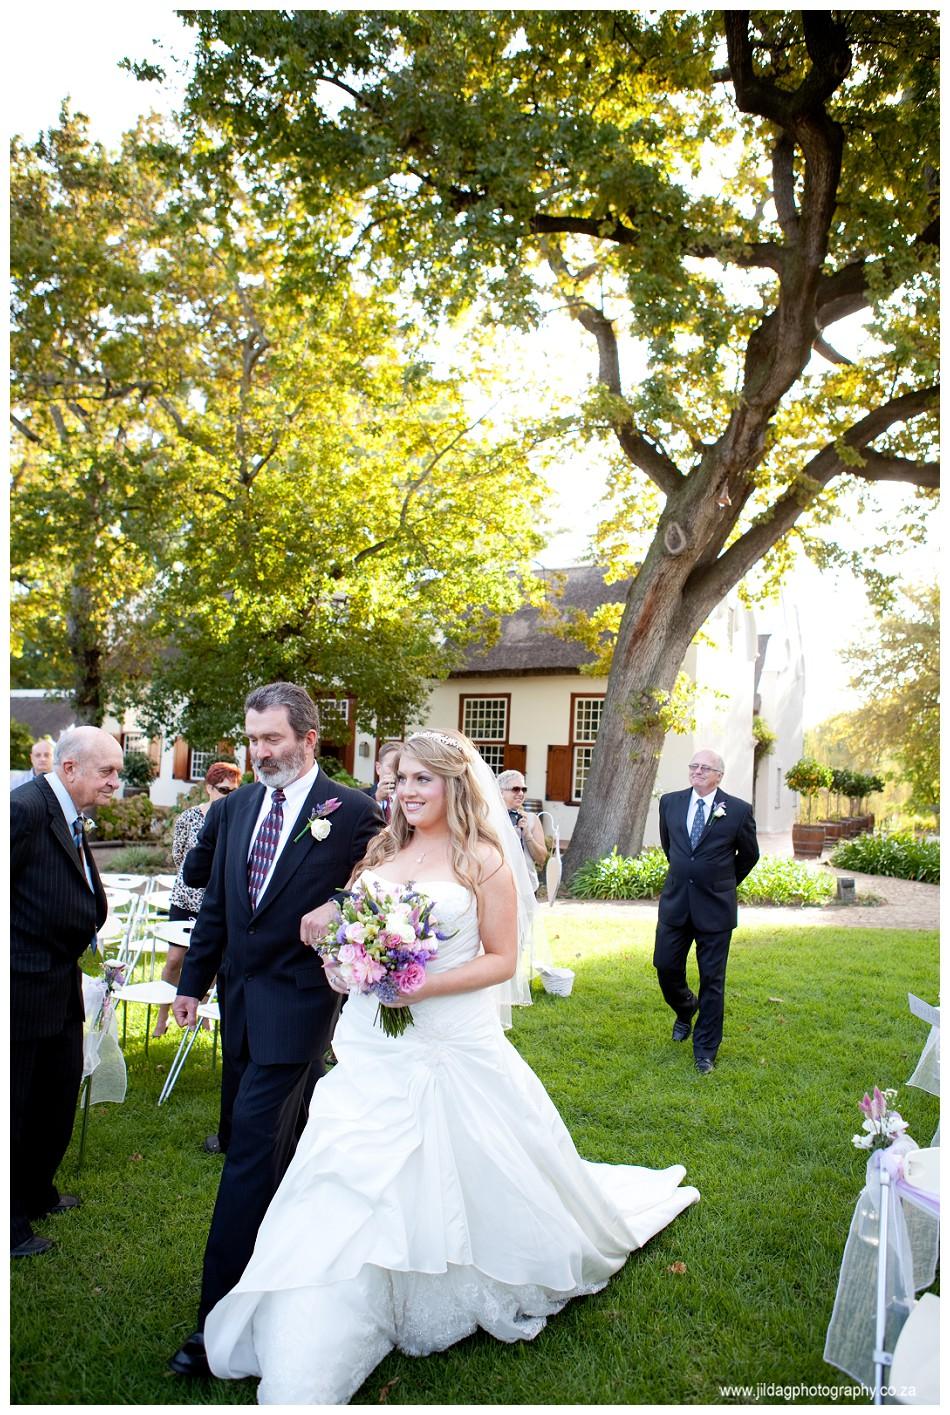 Blaauklippen - Stellenbosch wedding - Jilda G Photography (39)